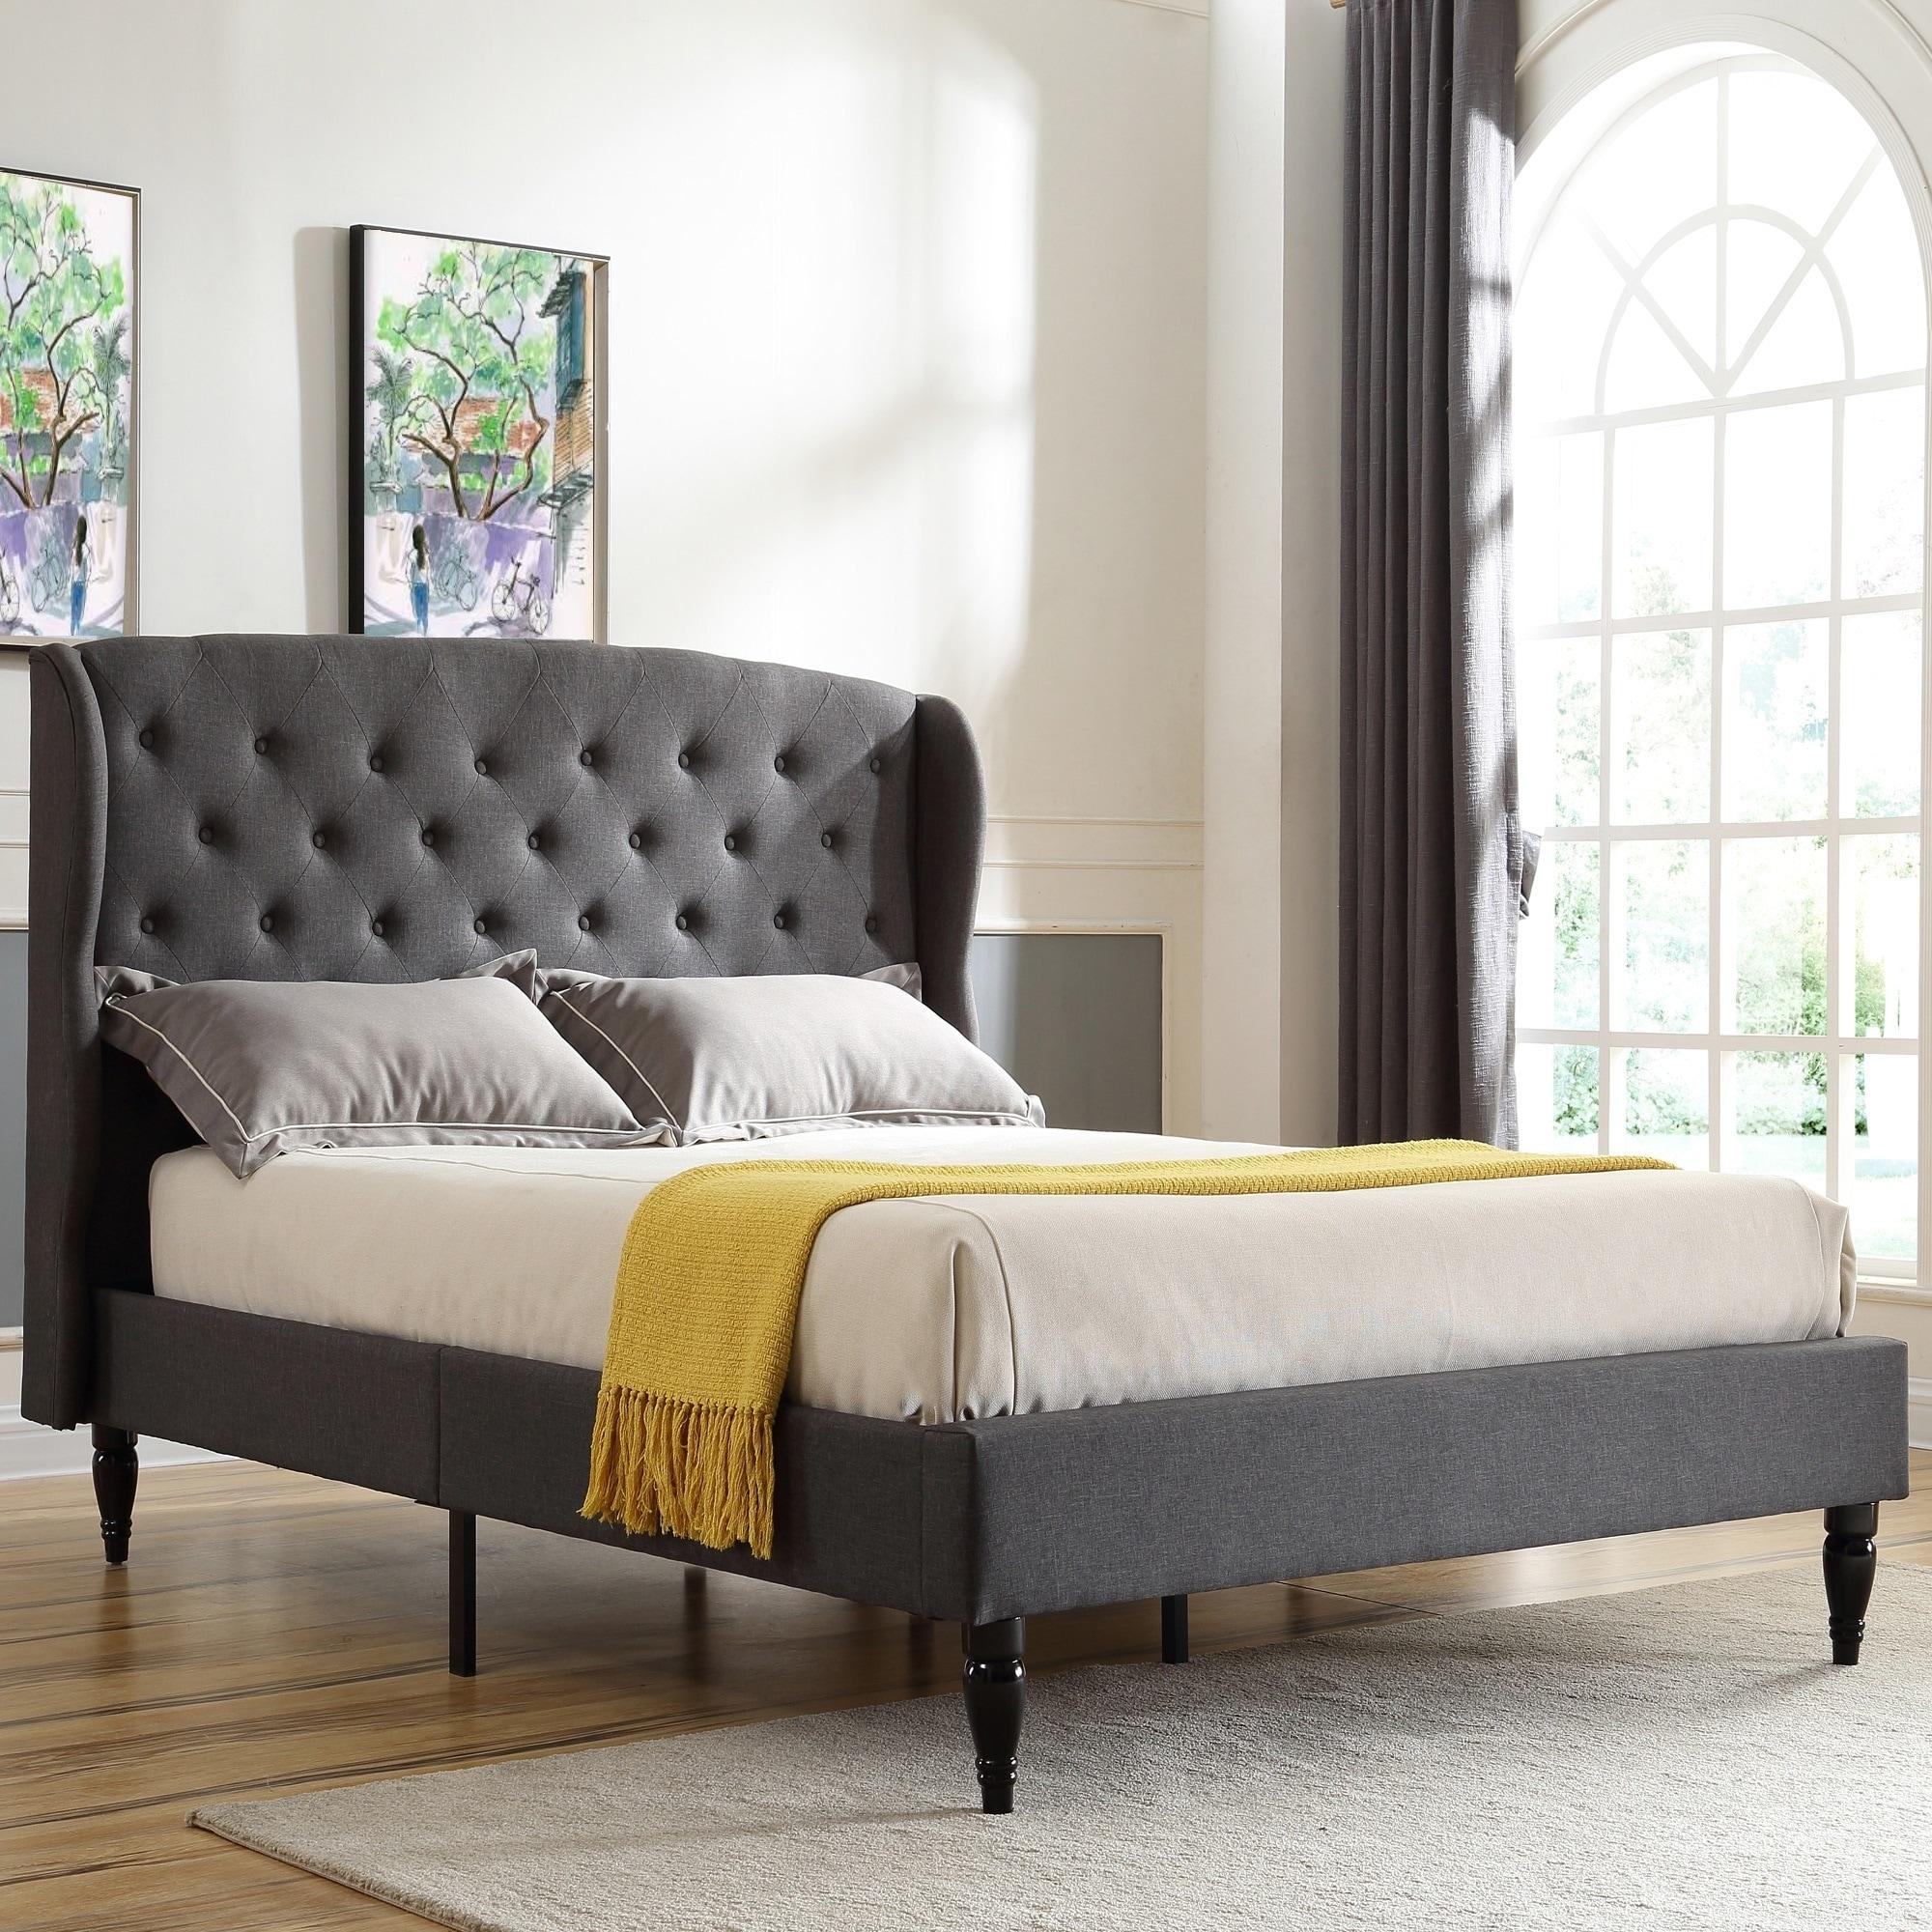 Queen Size Upholstered Linen Platform Bed Frame Headboard w//Wood Slats Gray